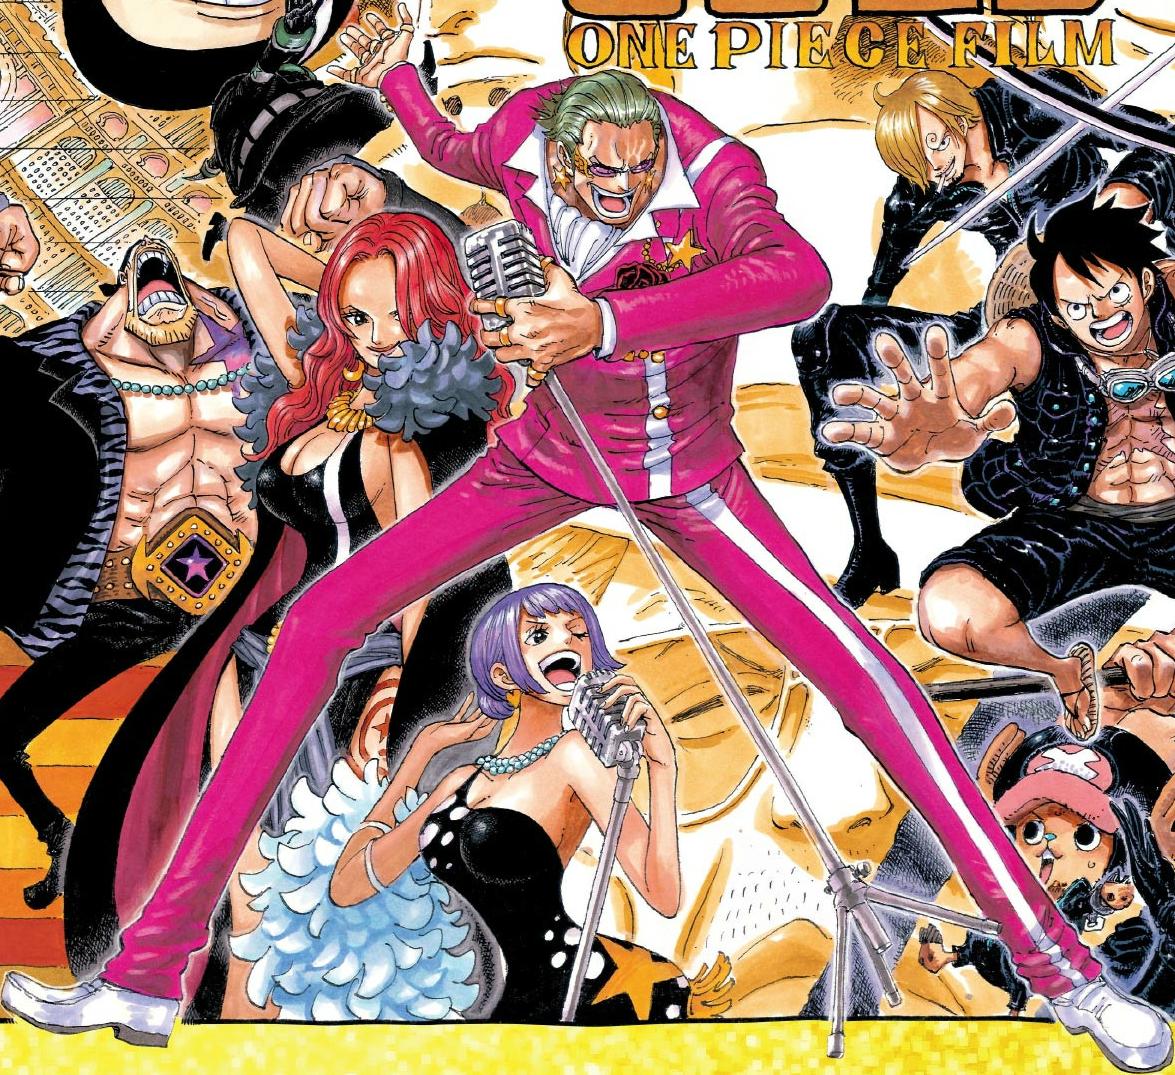 Image - Gild Tesoro Manga Infobox.png | One Piece Wiki | FANDOM powered by Wikia